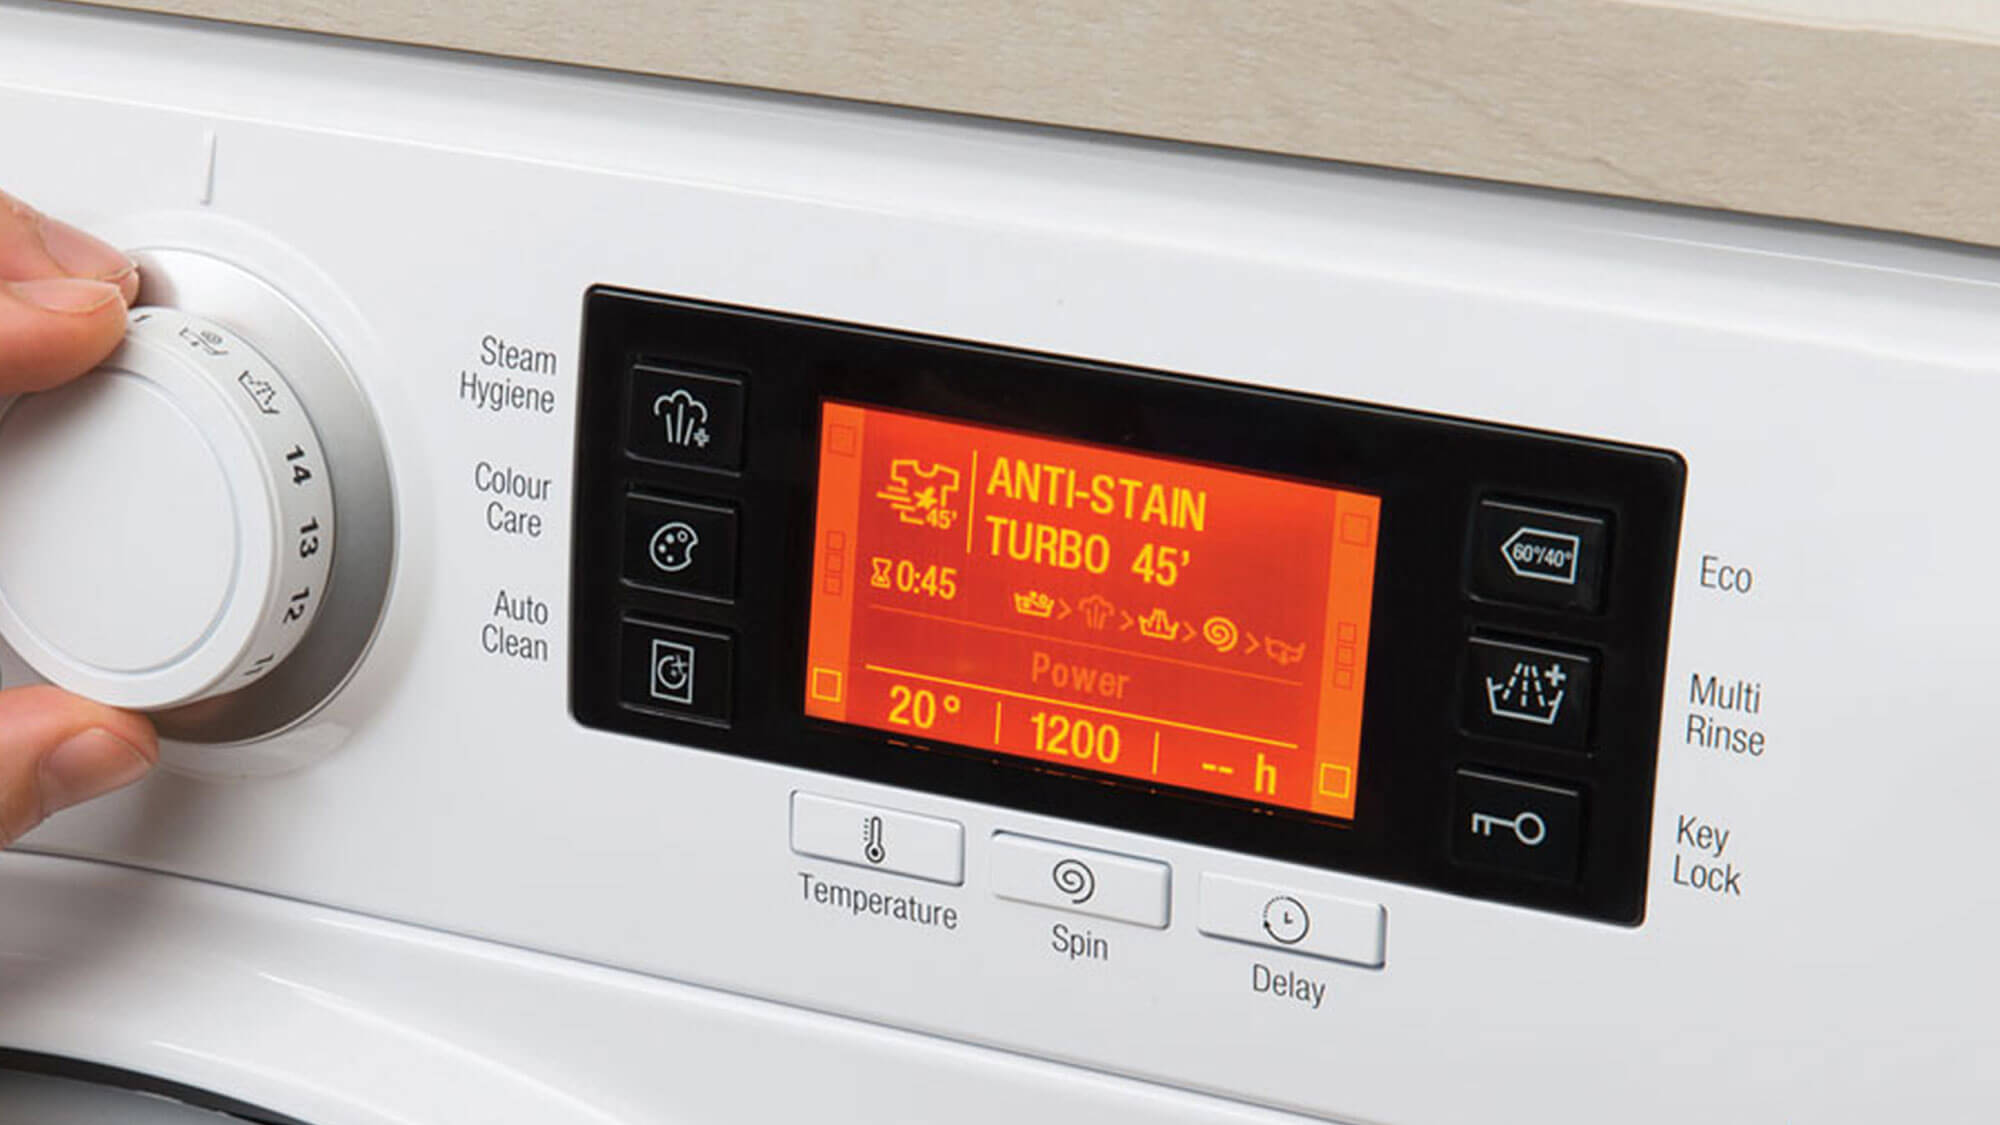 Why won't my washing machine start?